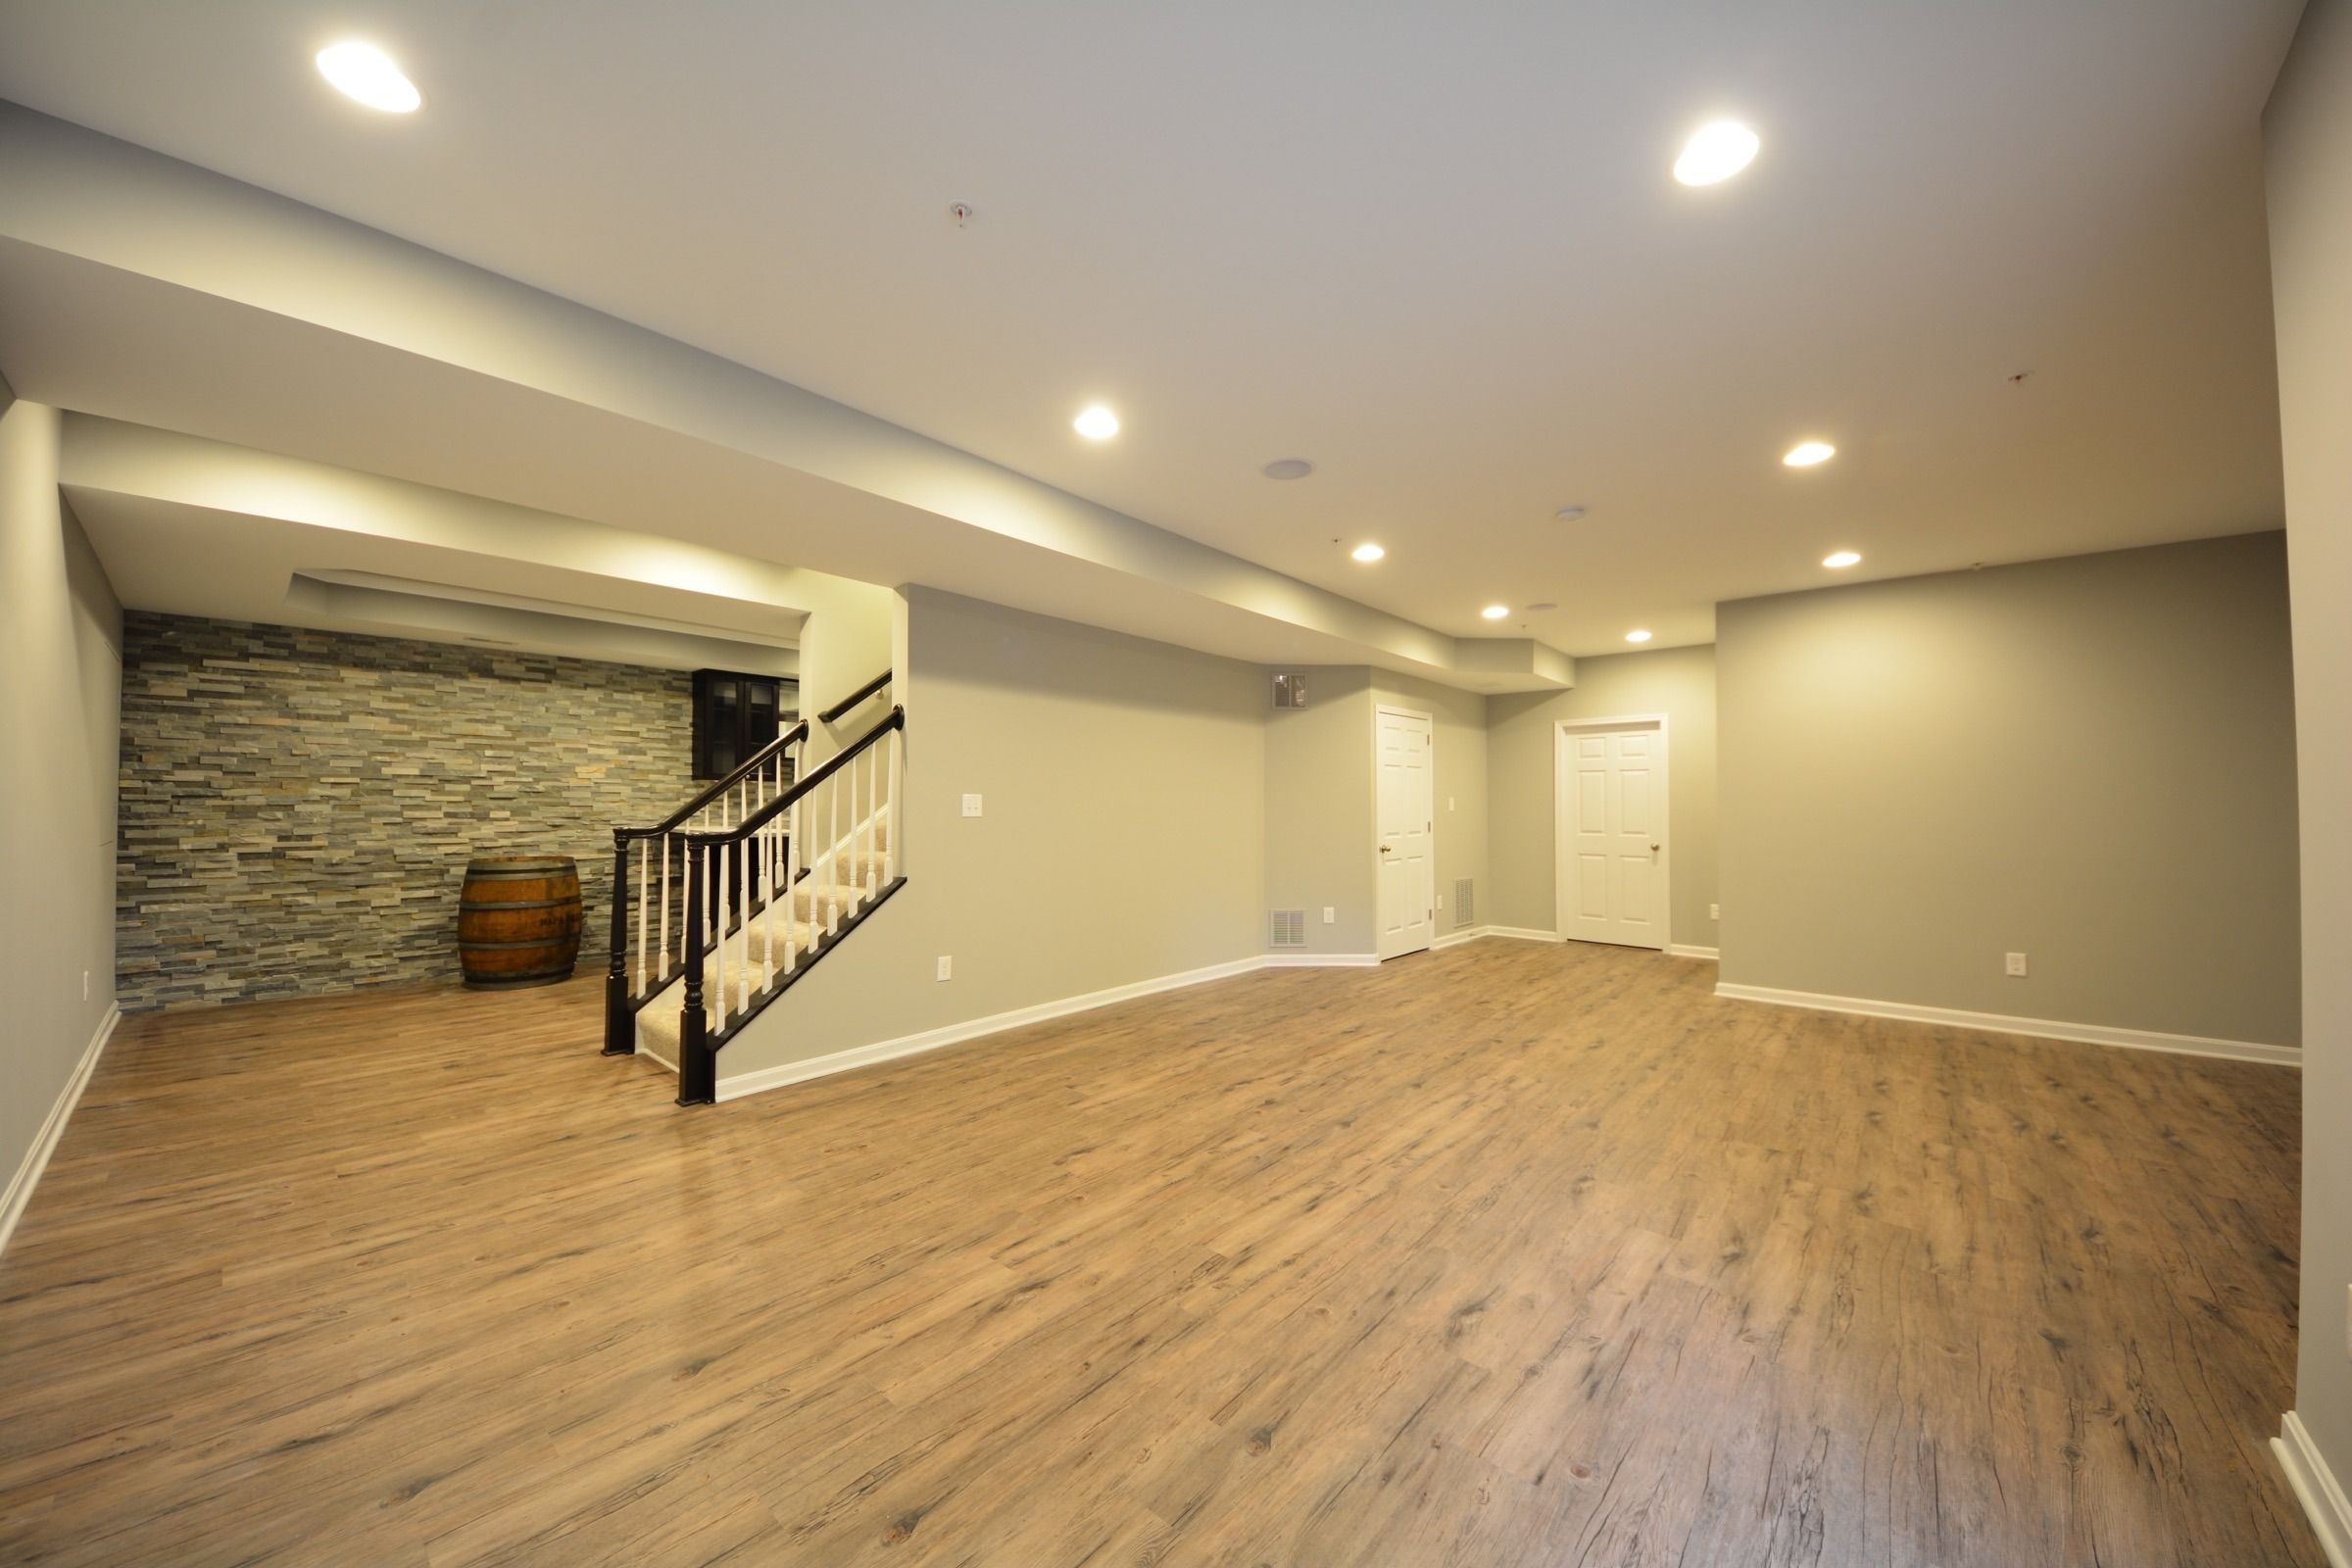 Basement Lvt Ideas Basement Masters Basement Flooring Waterproof Basement Flooring Basement Flooring Options